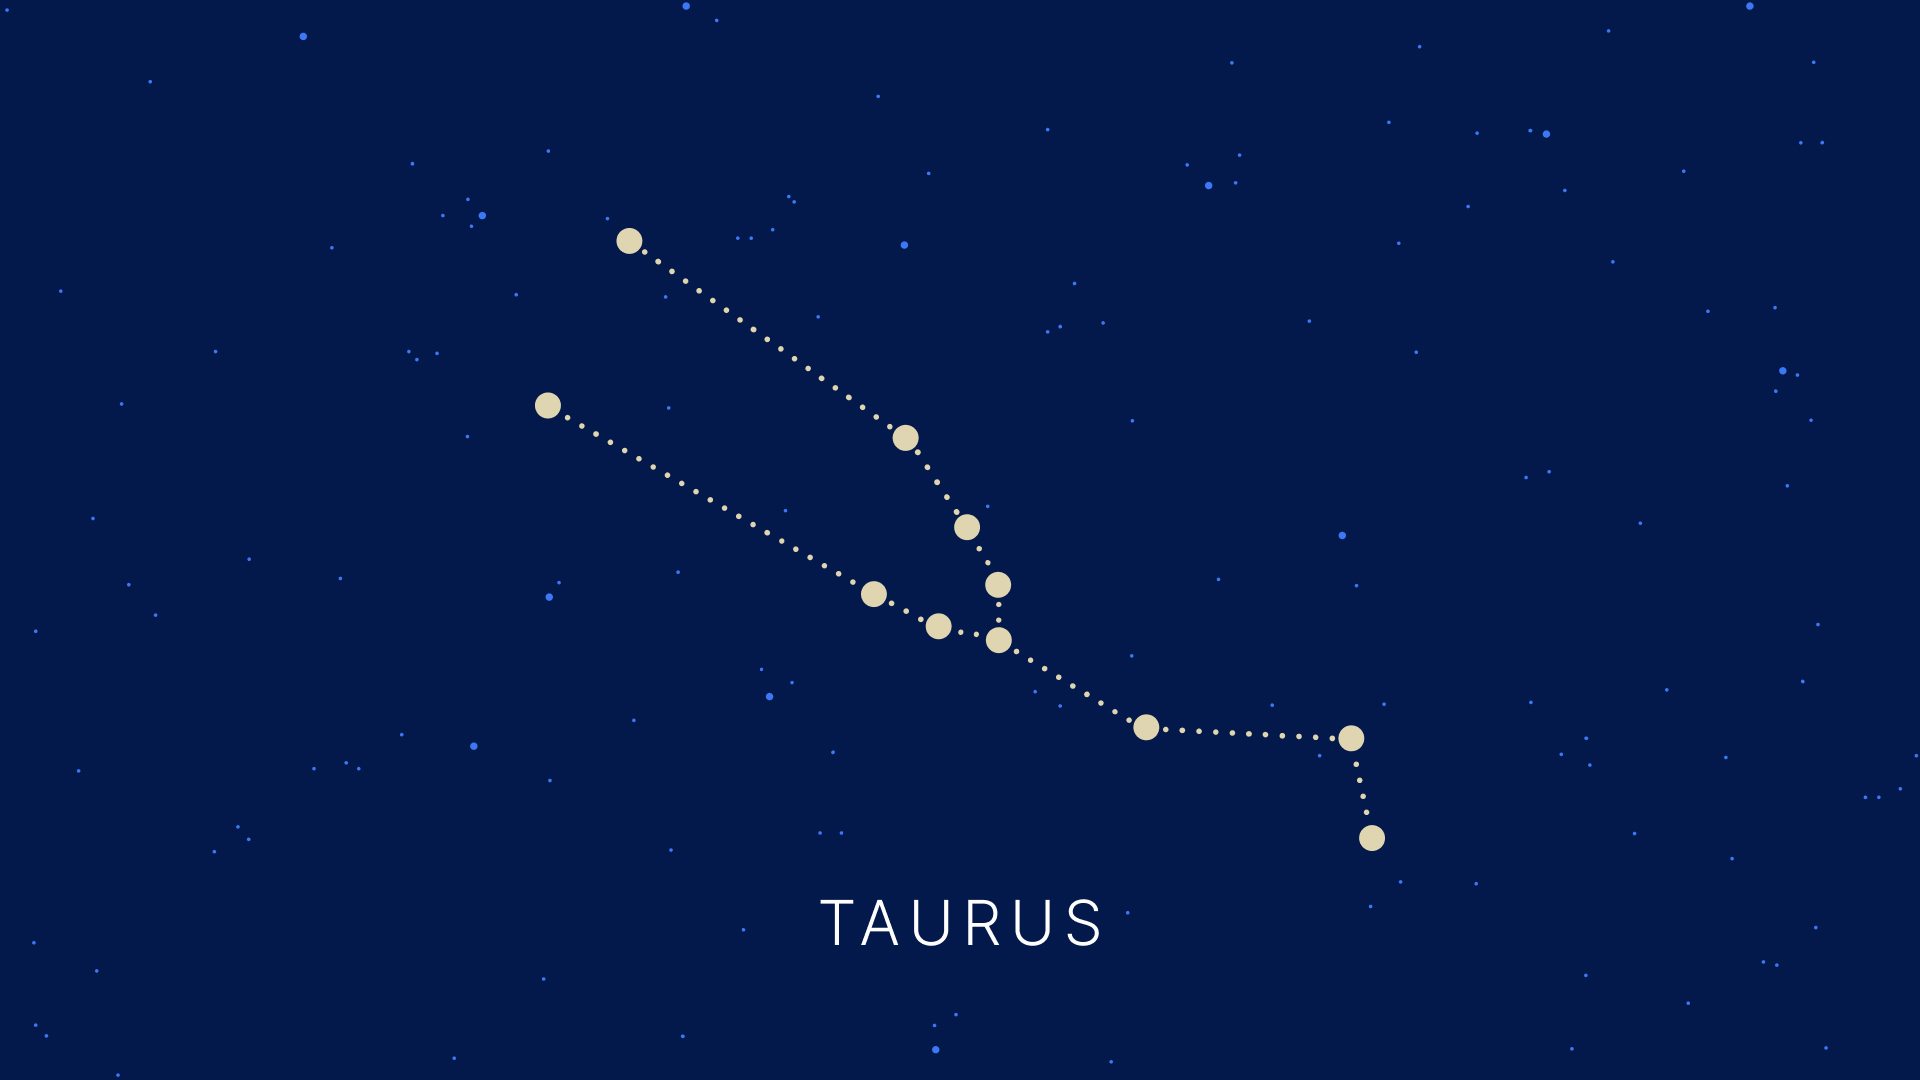 Sales Horoscope: Taurus